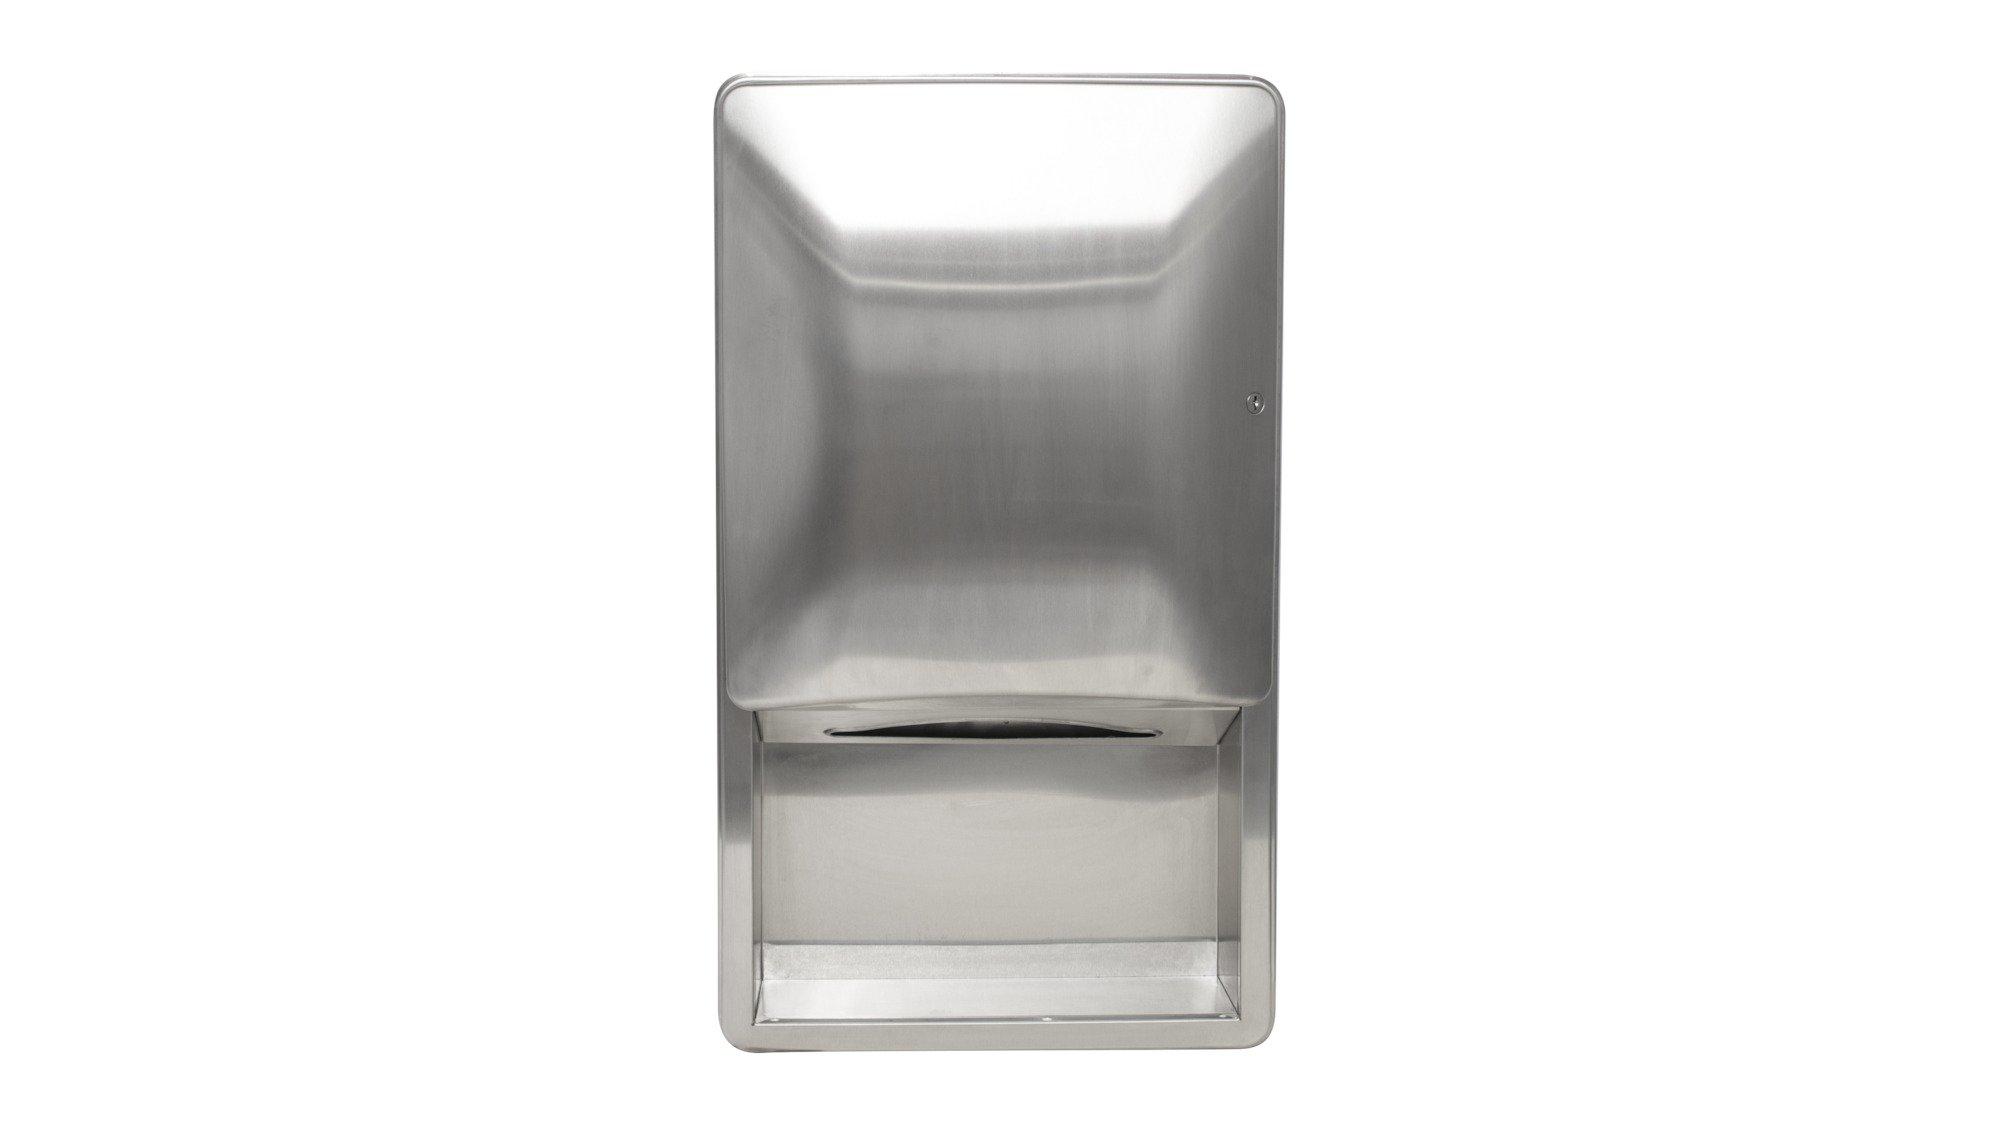 Multi Fold Paper Towels Dispenser 2A00 | Accurate Door & Hardware, Inc.